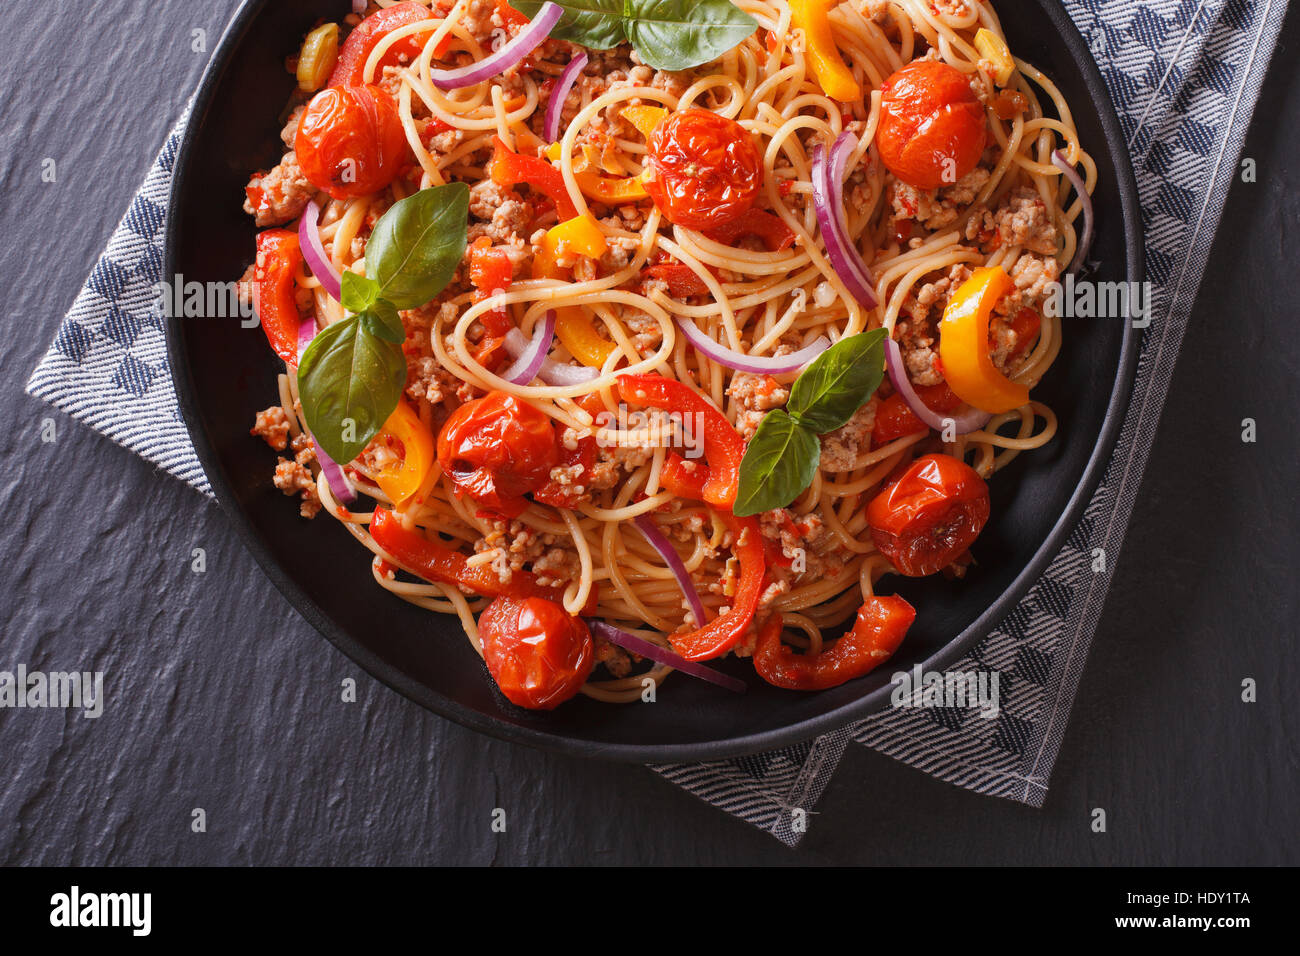 Comida italiana: pasta con carne picada y verduras cerca. Vista superior horizontal Imagen De Stock